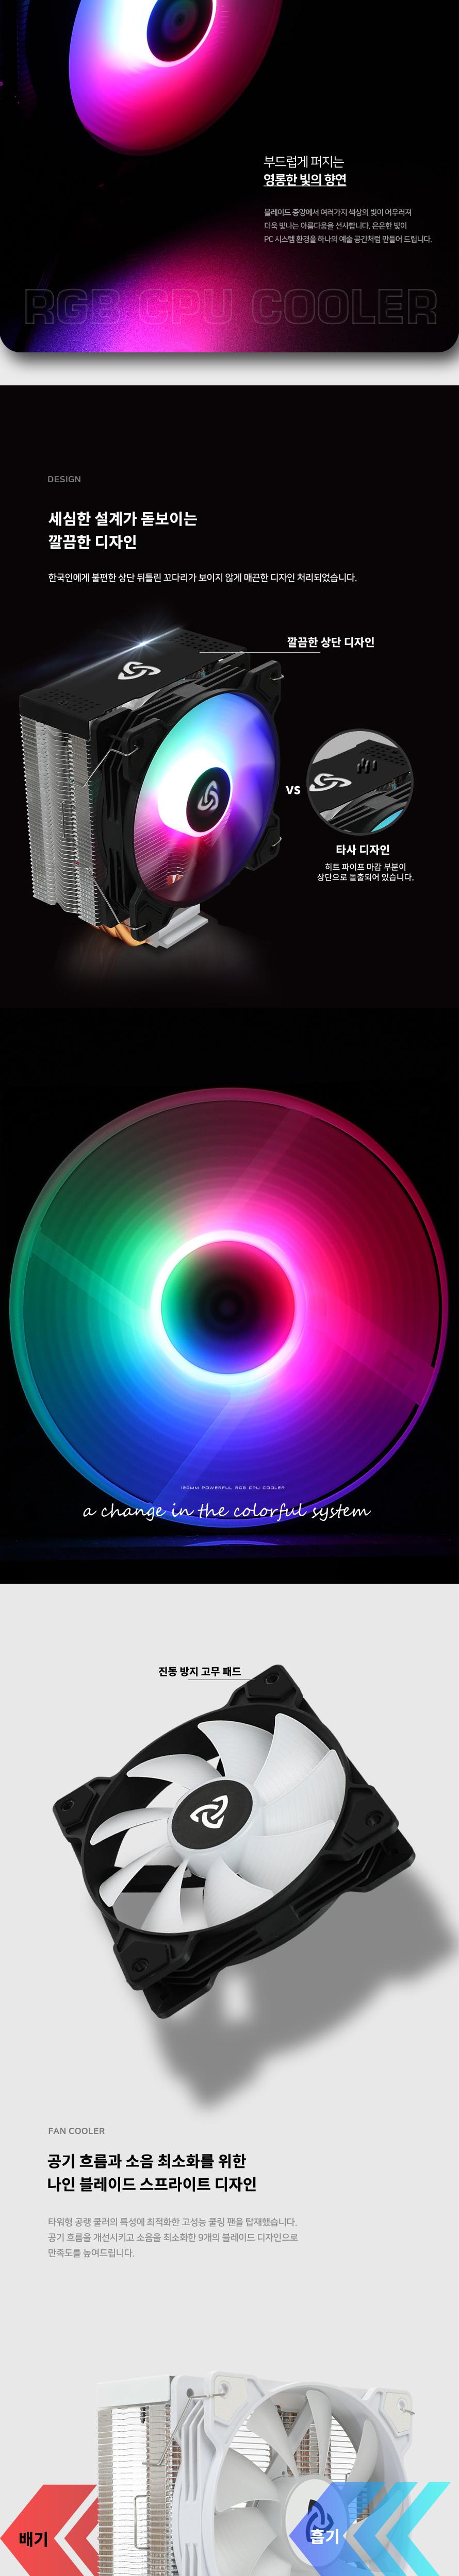 3RSYS TEAMMOST TM-30 RGB (WHITE)